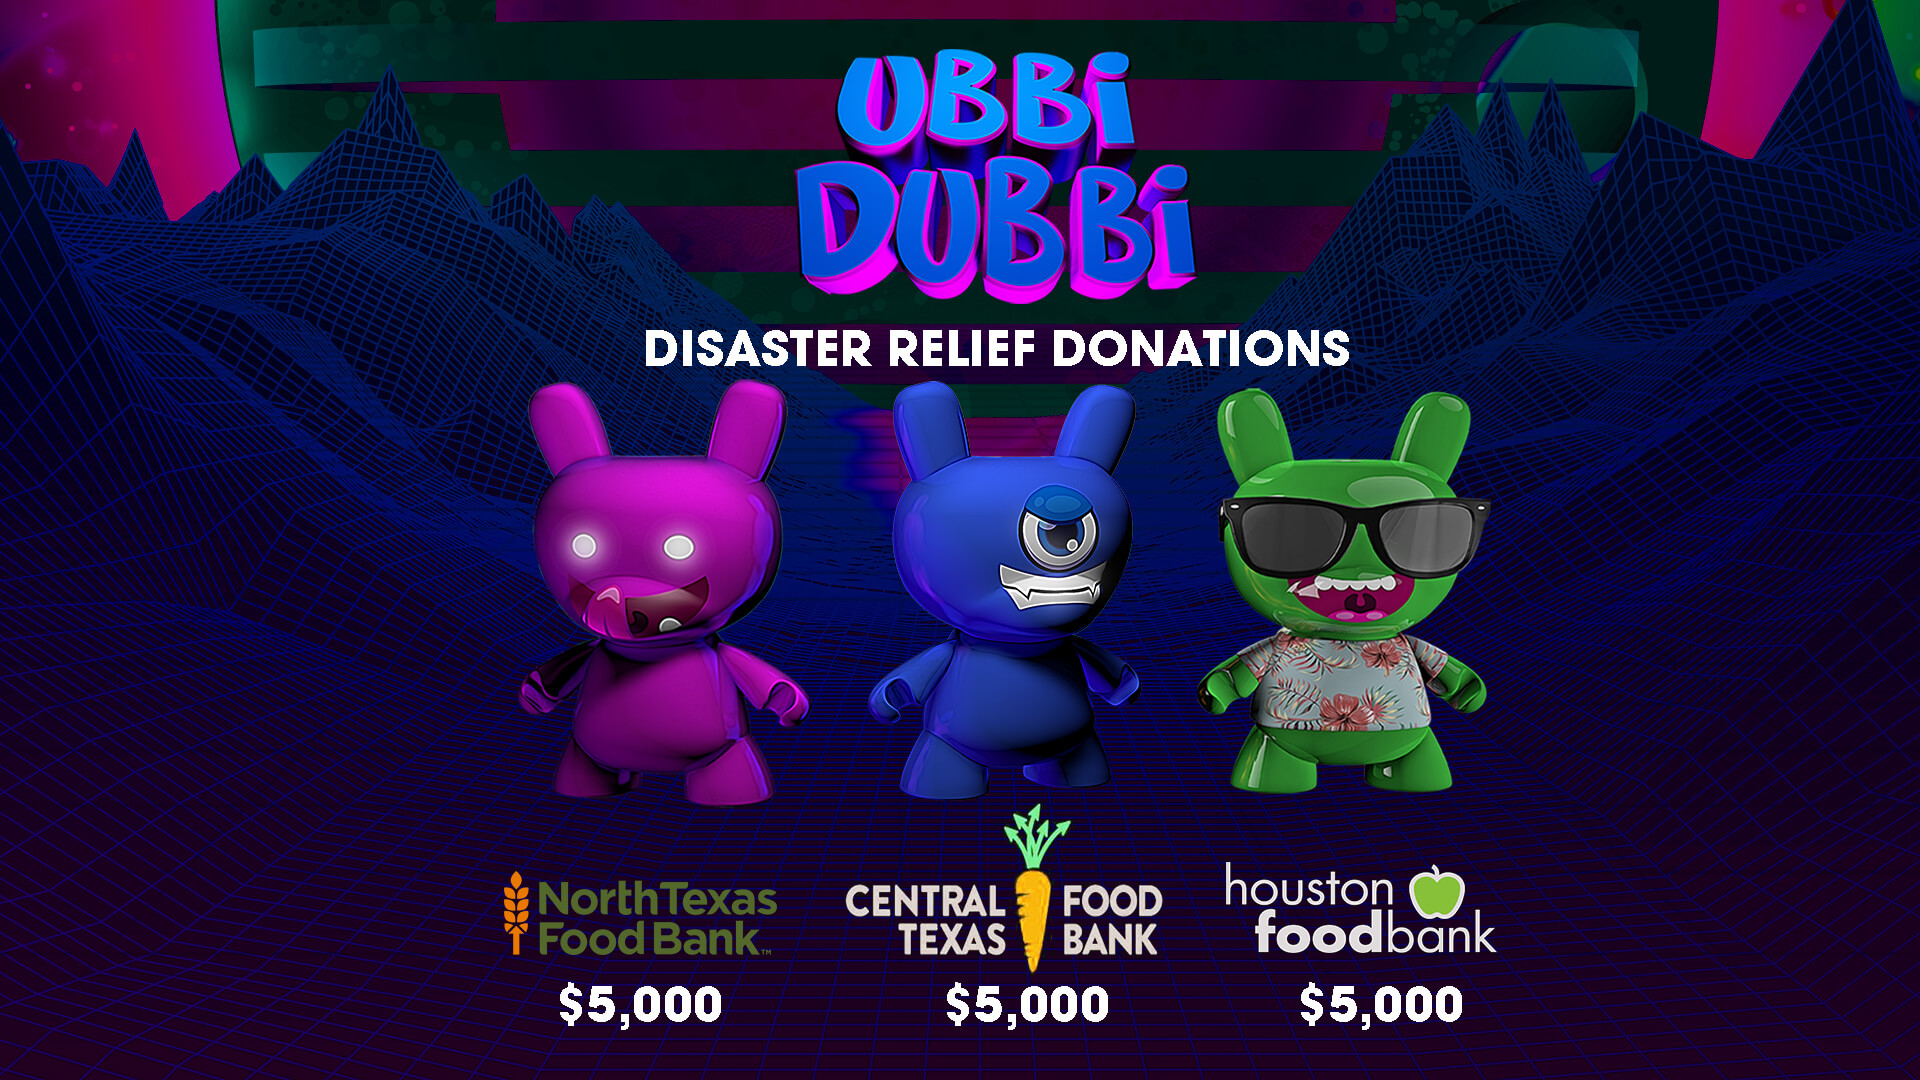 Ubbi Dubbi Donates to Texas Food Banks